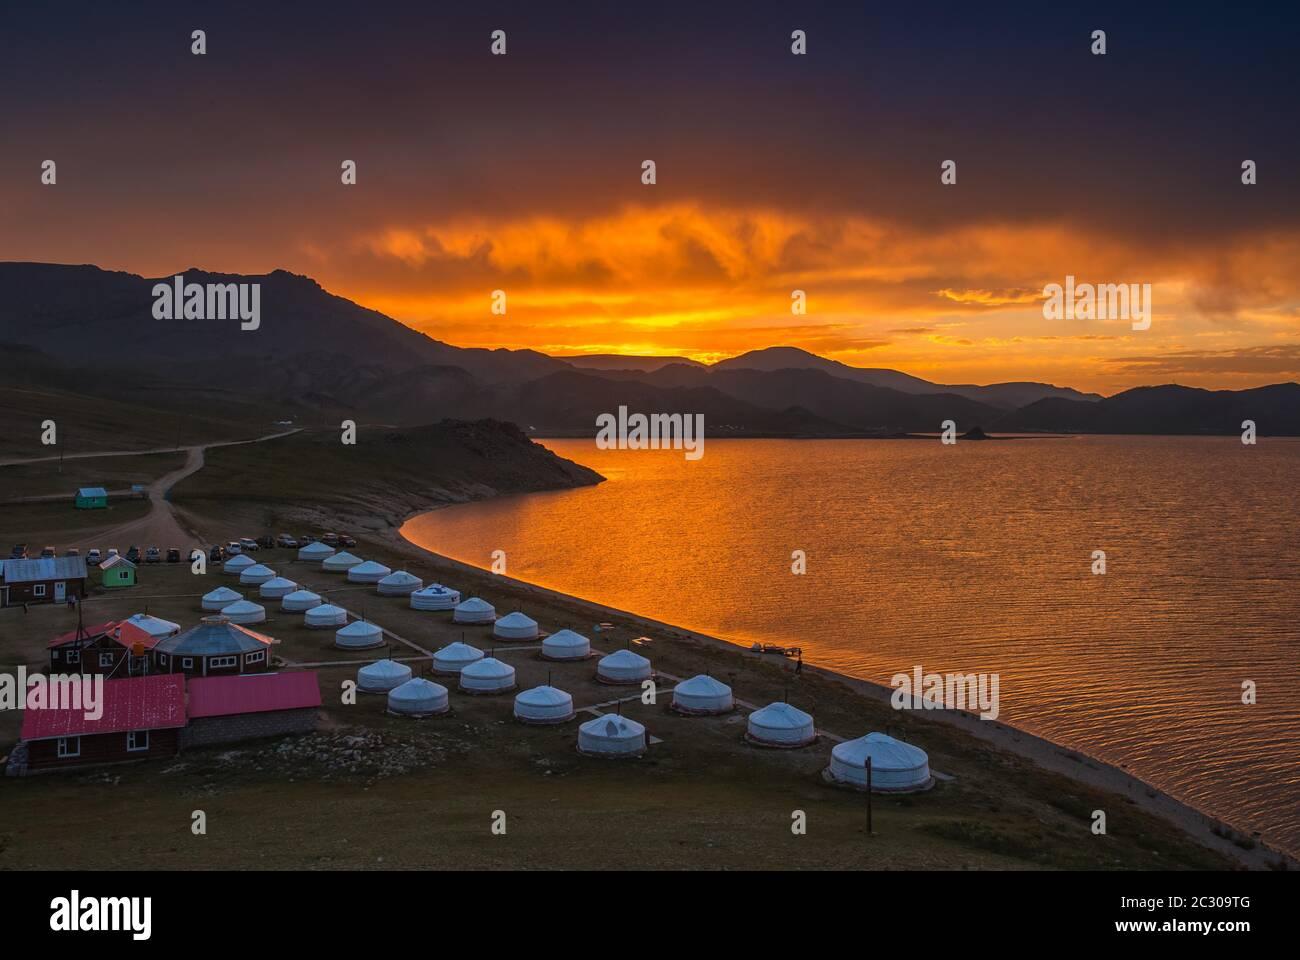 Alba al lago White Terkh, ger, tenda nomad, resort sulla riva del lago, Arkhangai Provincia, Mongolia Foto Stock